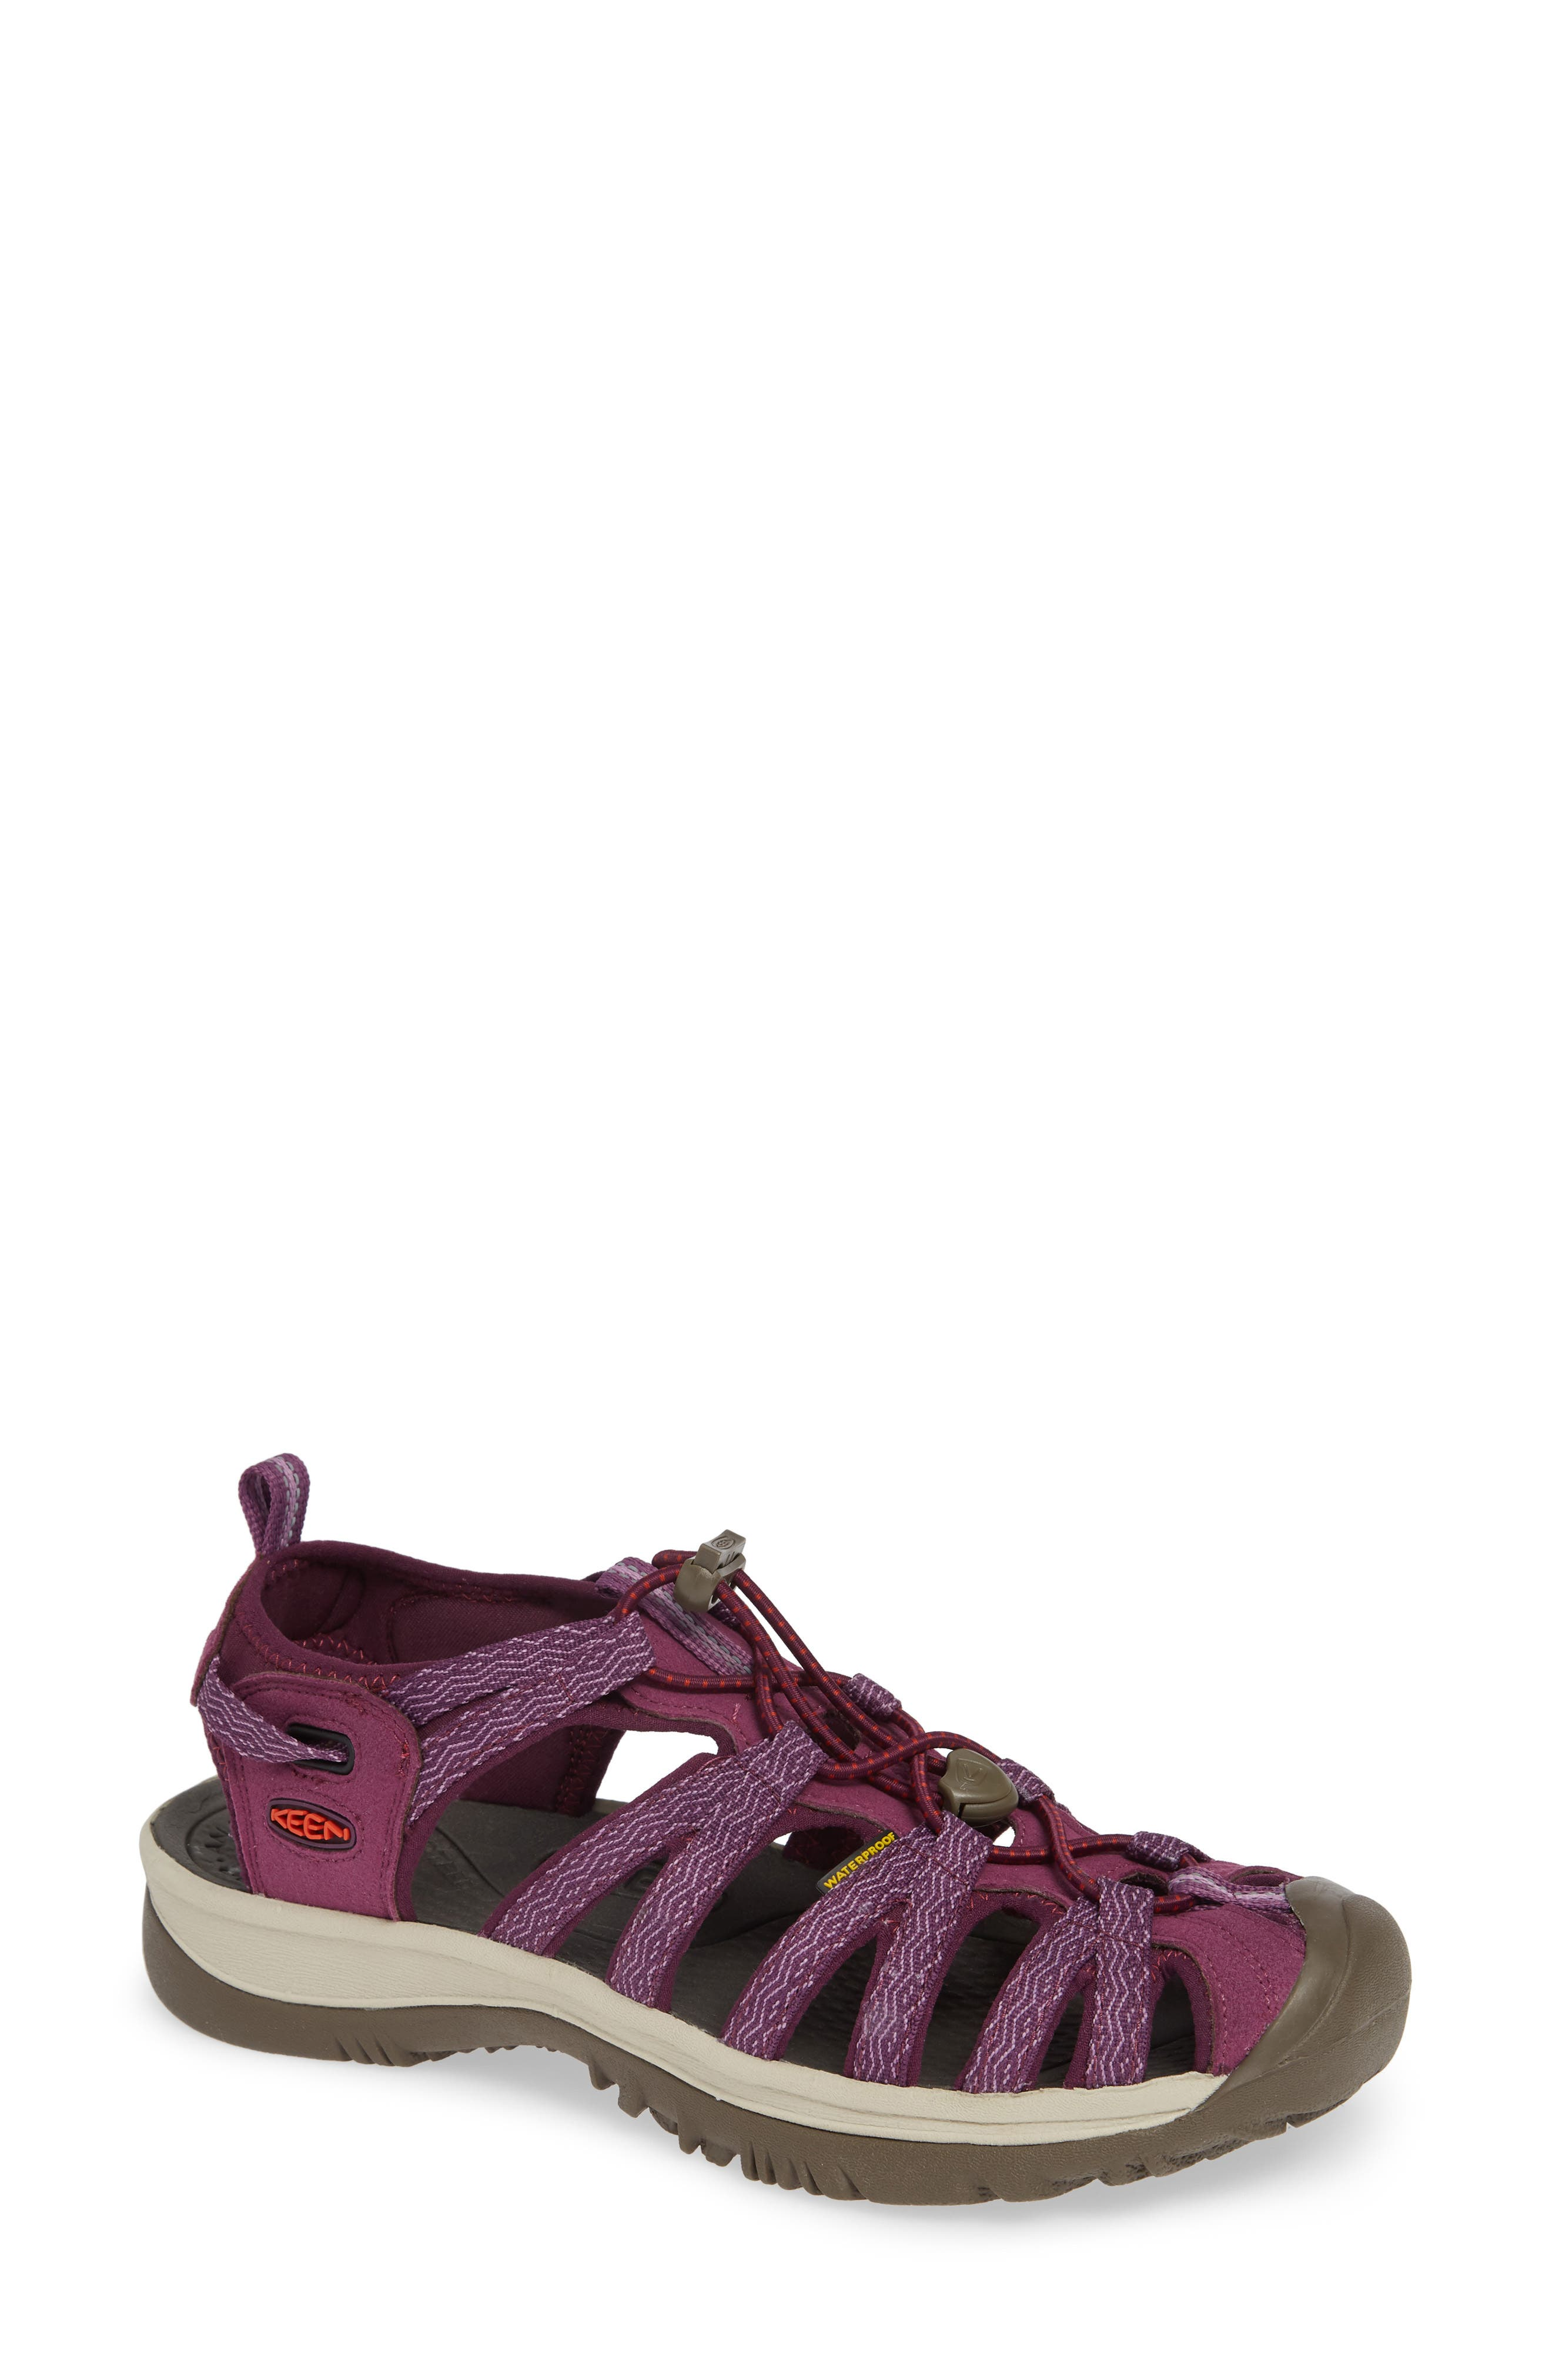 'Whisper' Water Friendly Sport Sandal,                         Main,                         color, Grape Kiss/ Grape Wine